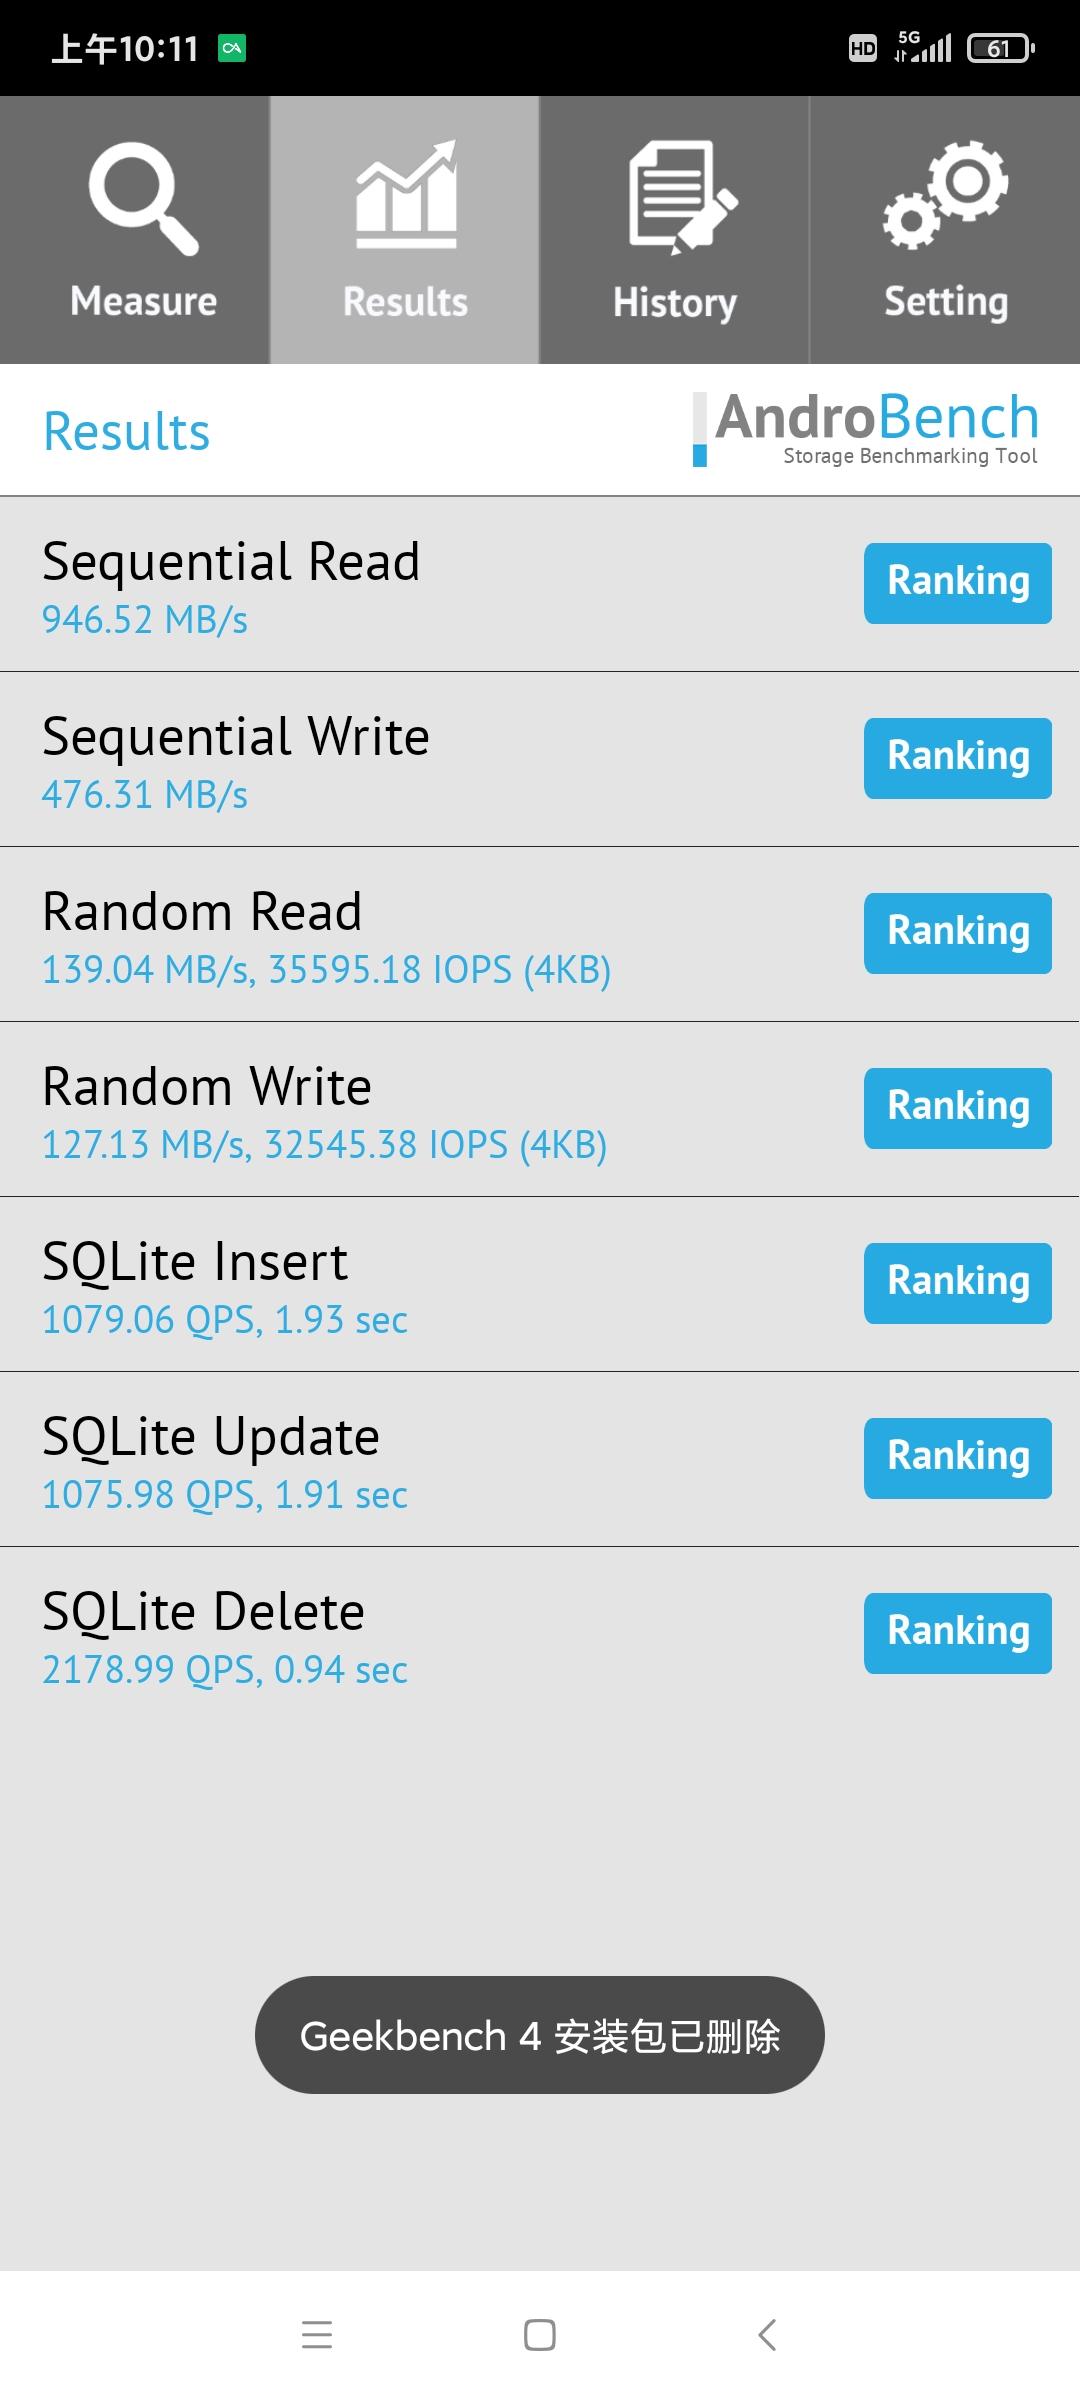 Screenshot_2020-08-17-10-11-57-571_com.andromeda.androbench2.jpg